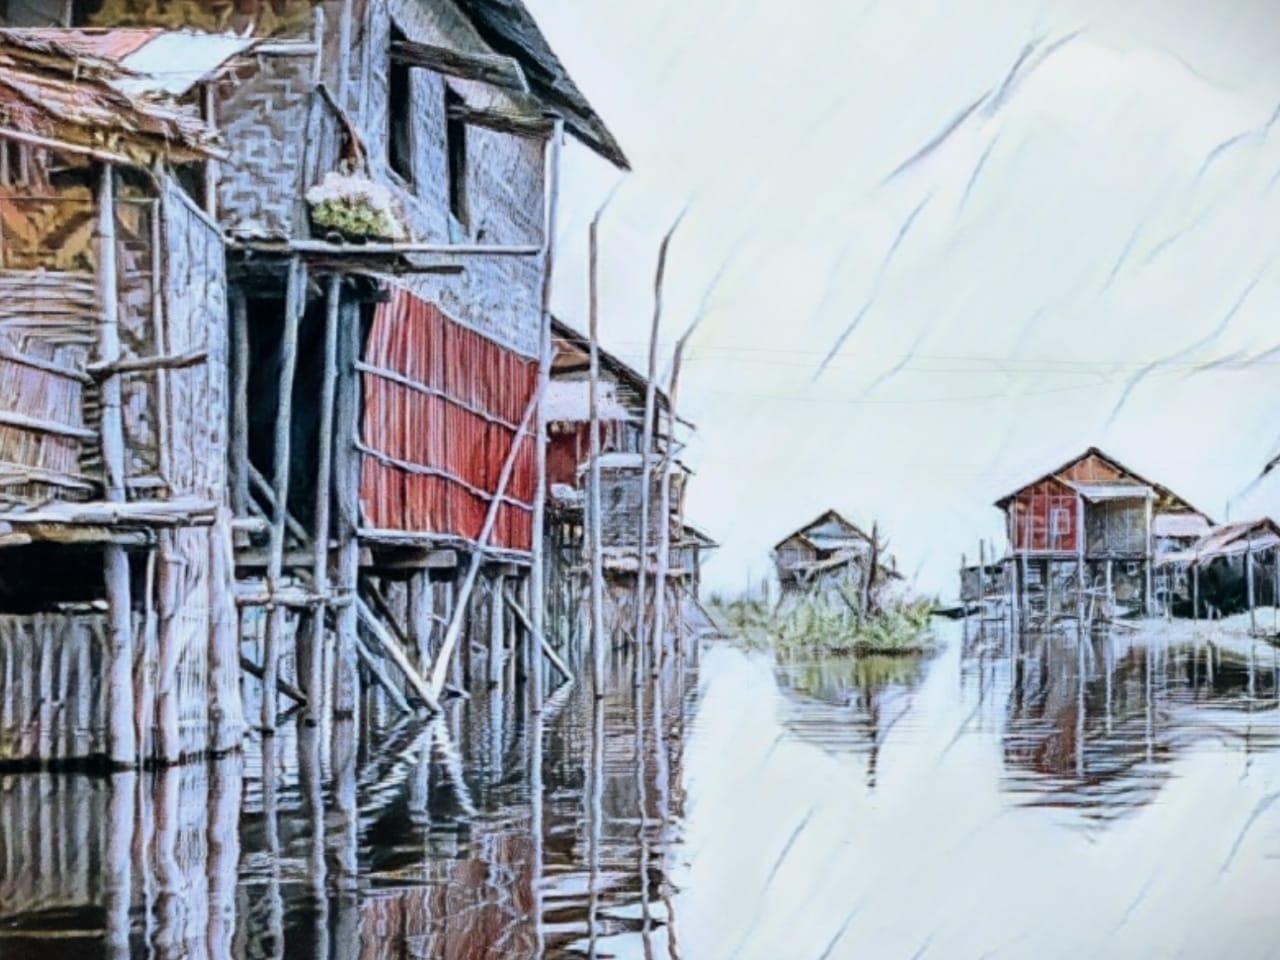 https: img.okezone.com content 2020 02 24 340 2173072 bpbd-banjir-lombok-timur-menyebabkan-kerusakan-bangunan-dan-infrastruktur-pp17TfXdPx.jpg